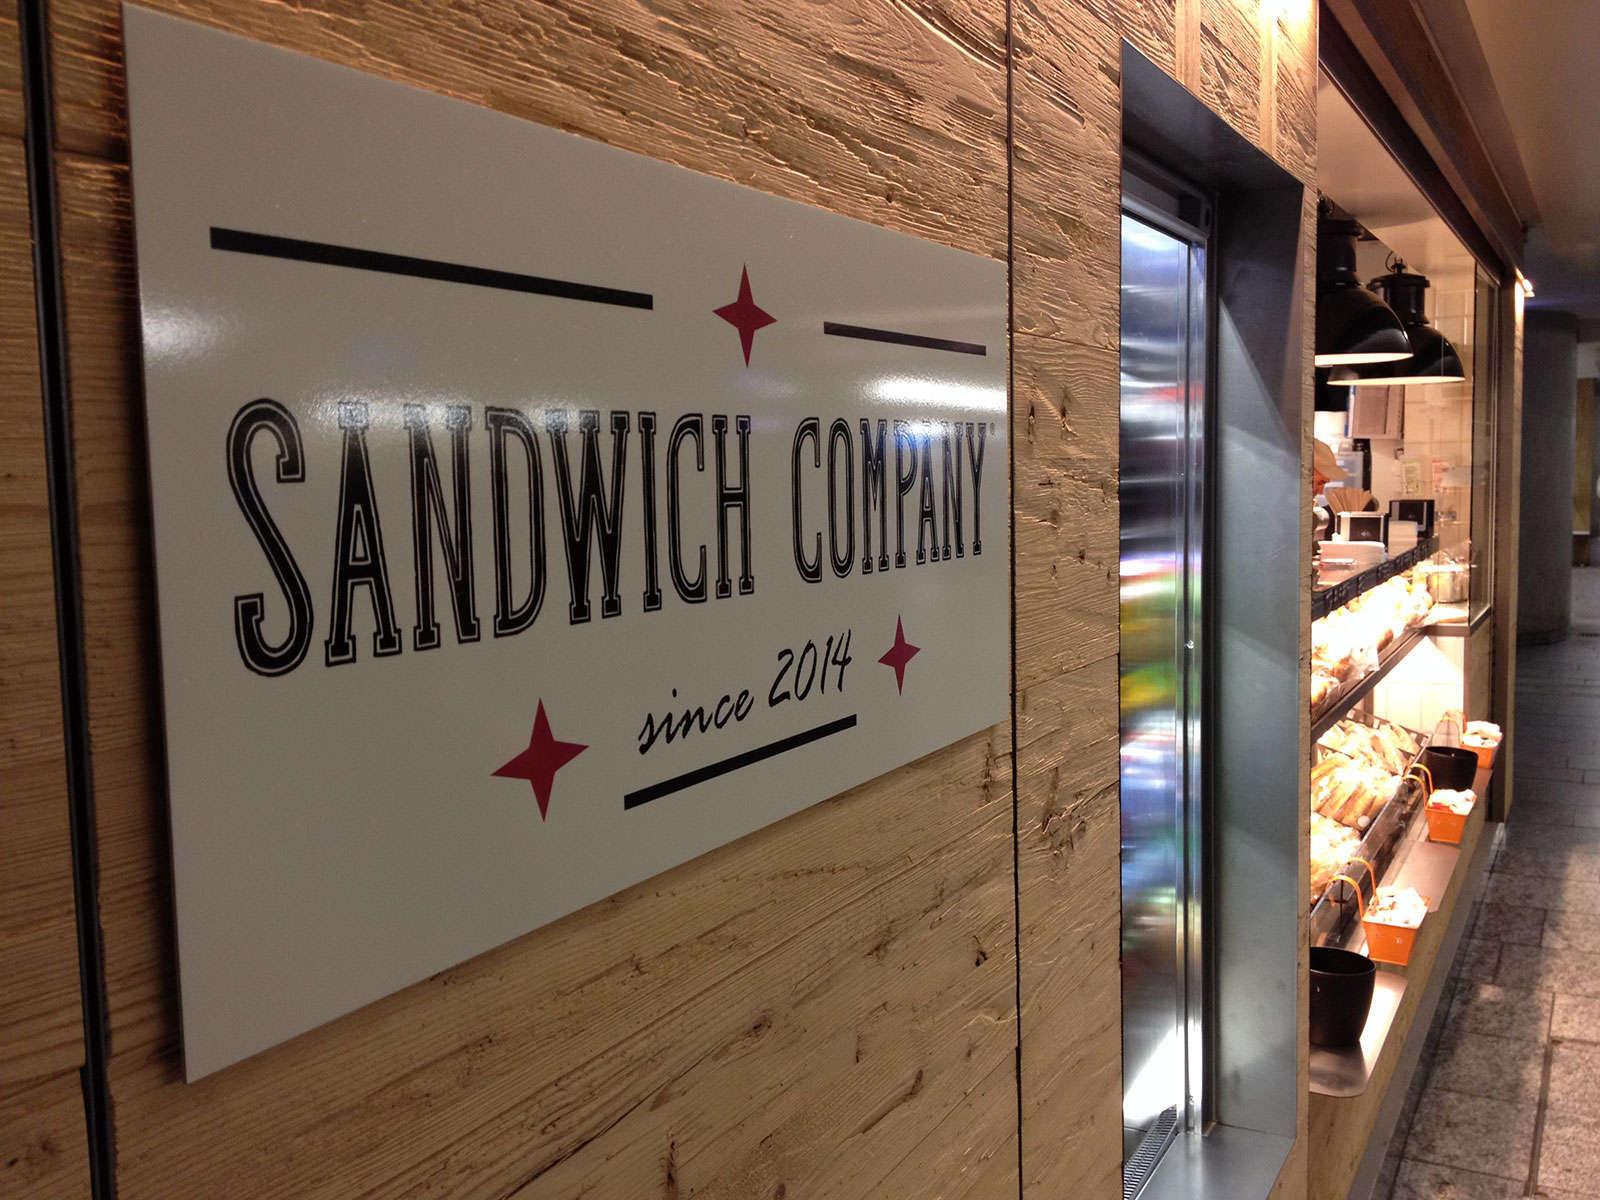 Sandwich Company